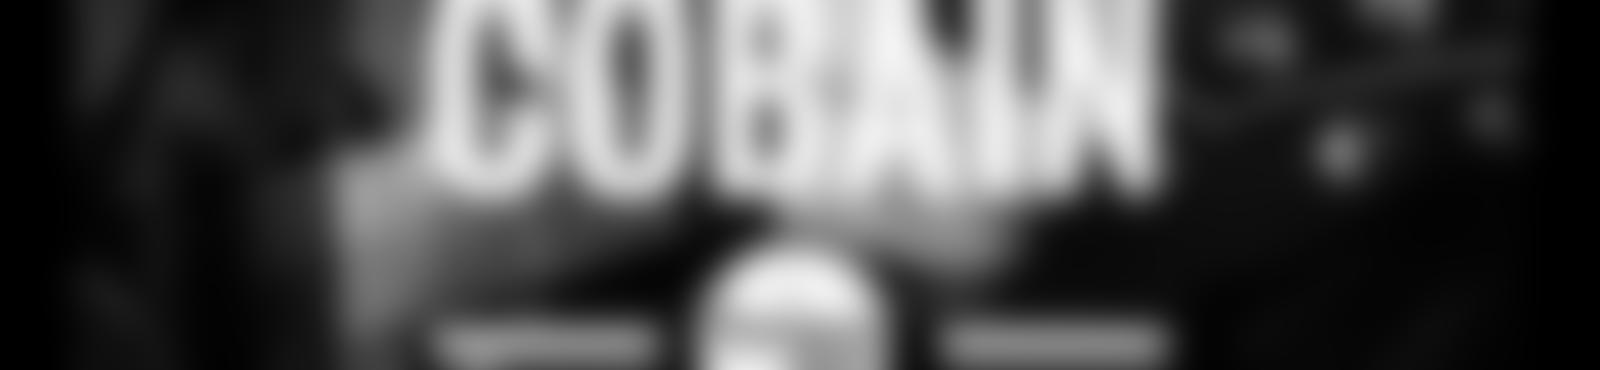 Blurred 162e6eb9 b4f5 49ea bded 0cffb2d2f4c5